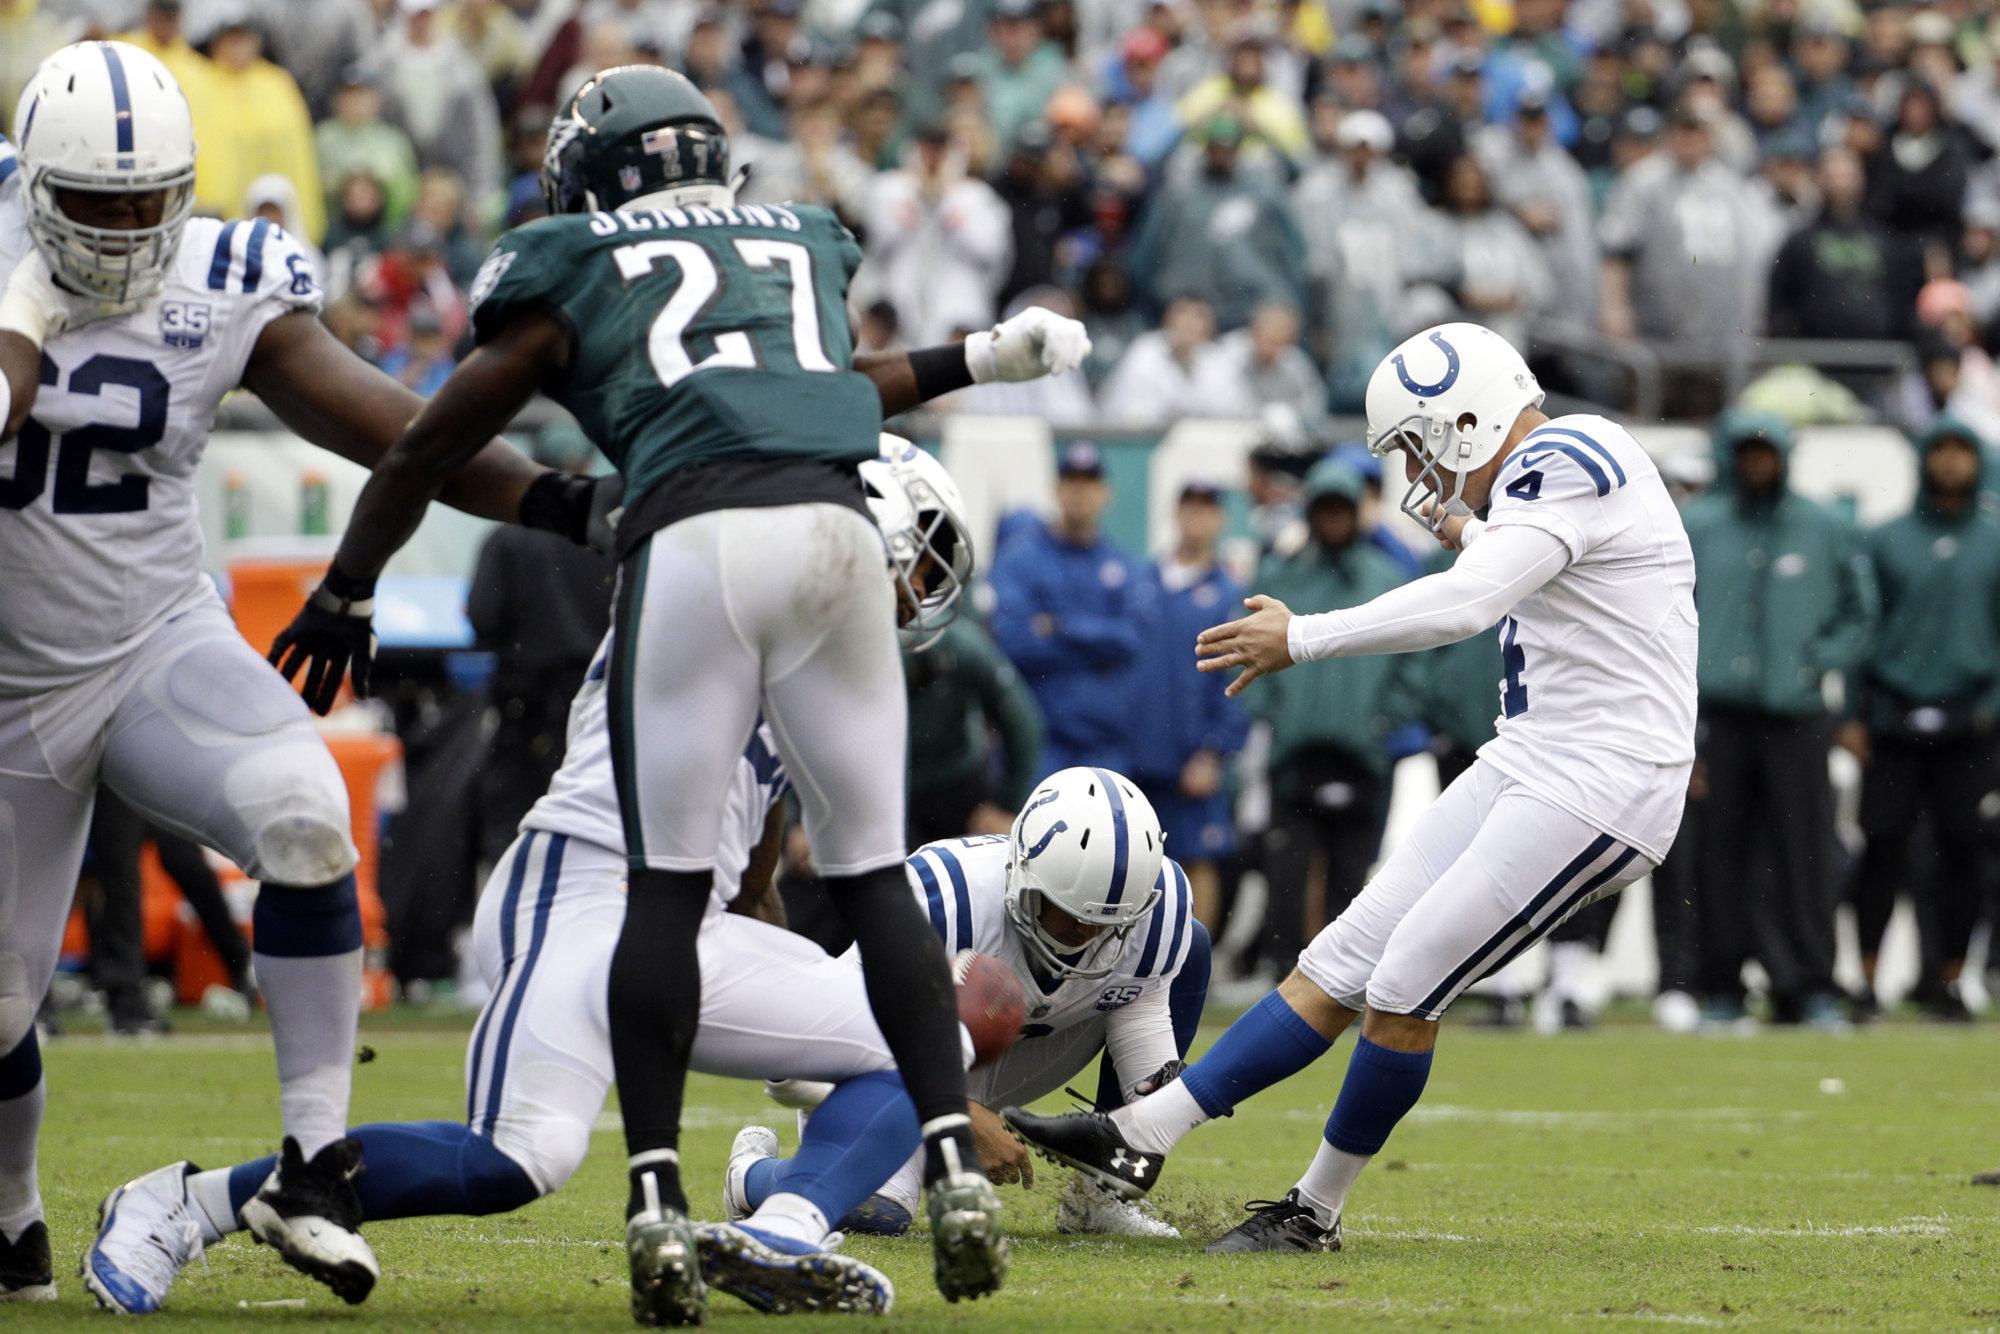 Indianapolis Colts' Adam Vinatieri (4) kicks a field goal during the second half of an NFL football game against the Philadelphia Eagles, Sunday, Sept. 23, 2018, in Philadelphia. (AP Photo/Chris Szagola)